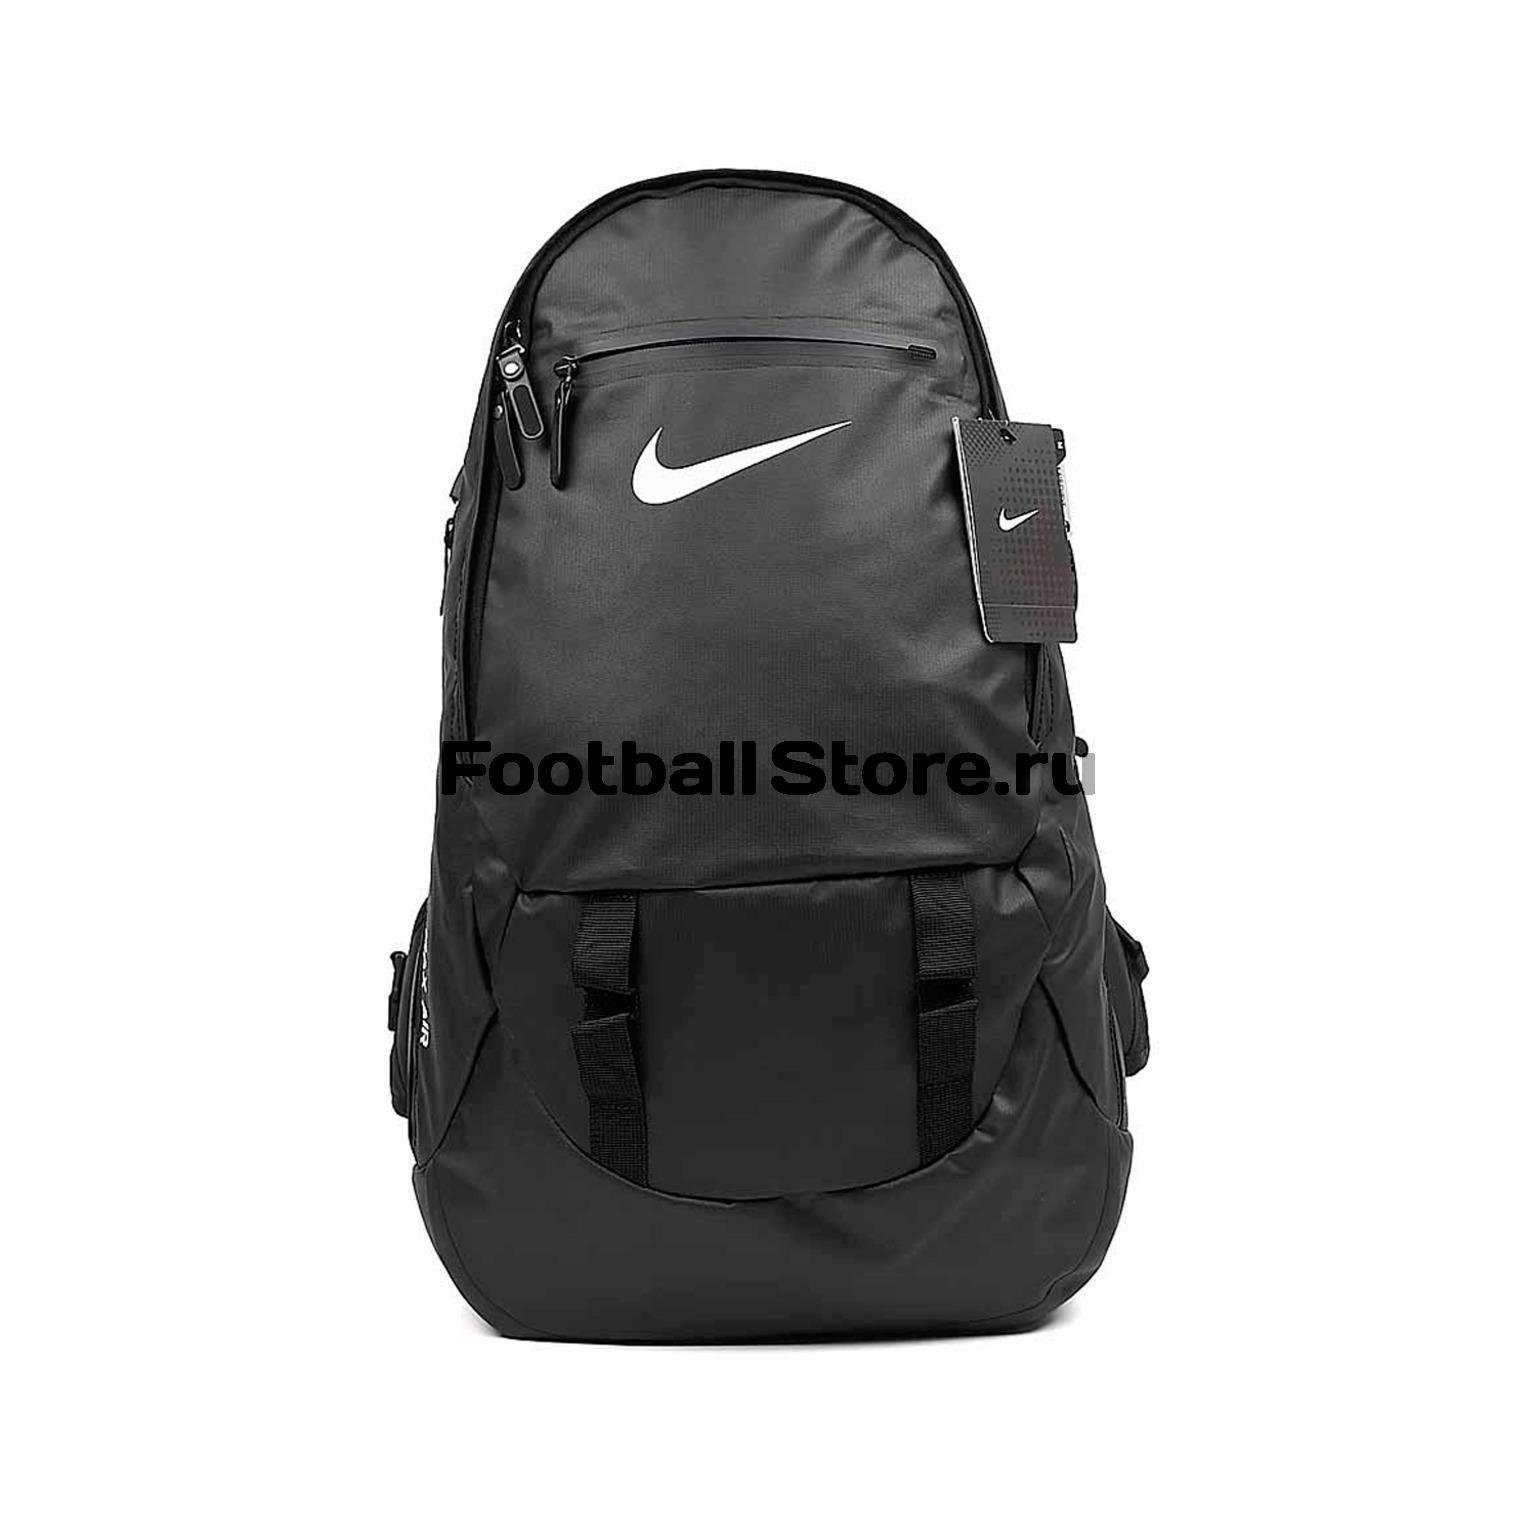 Сумки/Рюкзаки Nike Рюкзак Nike fb offense mx air plus bp